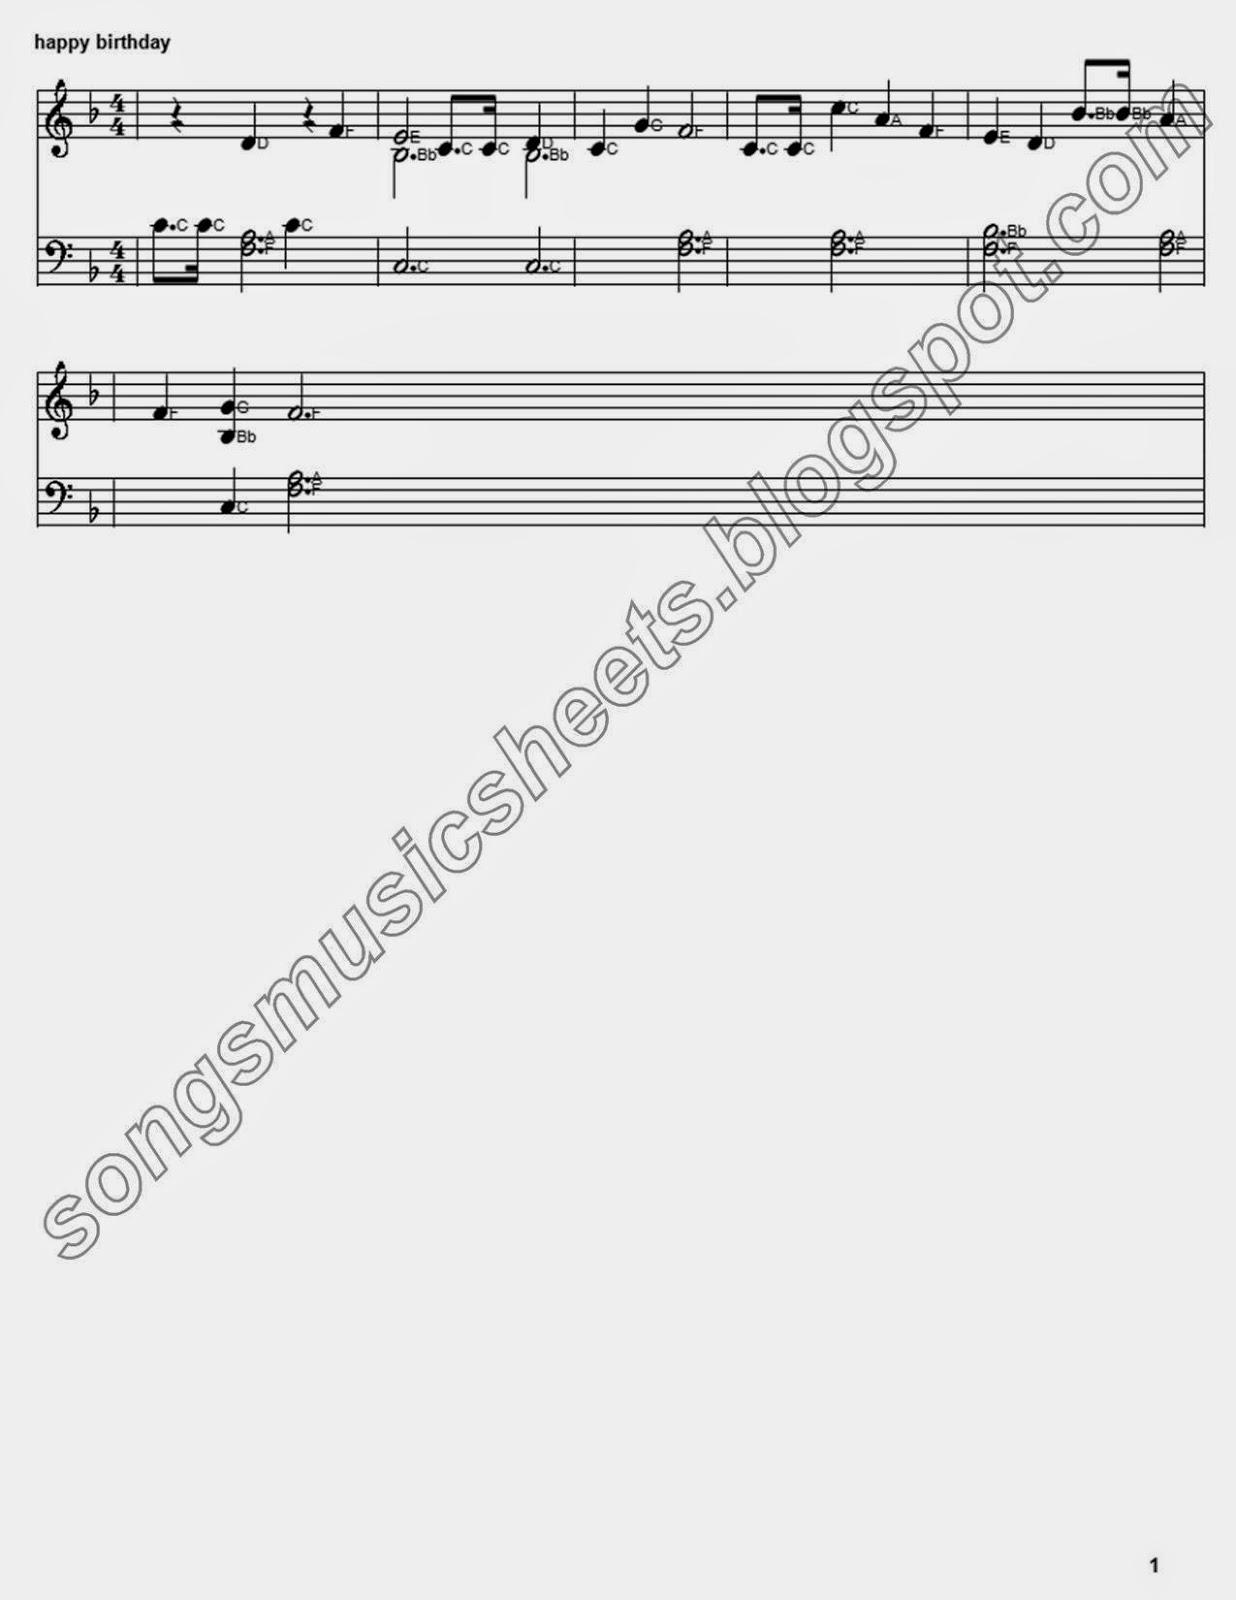 Happy Birthday Song Piano Music Sheet